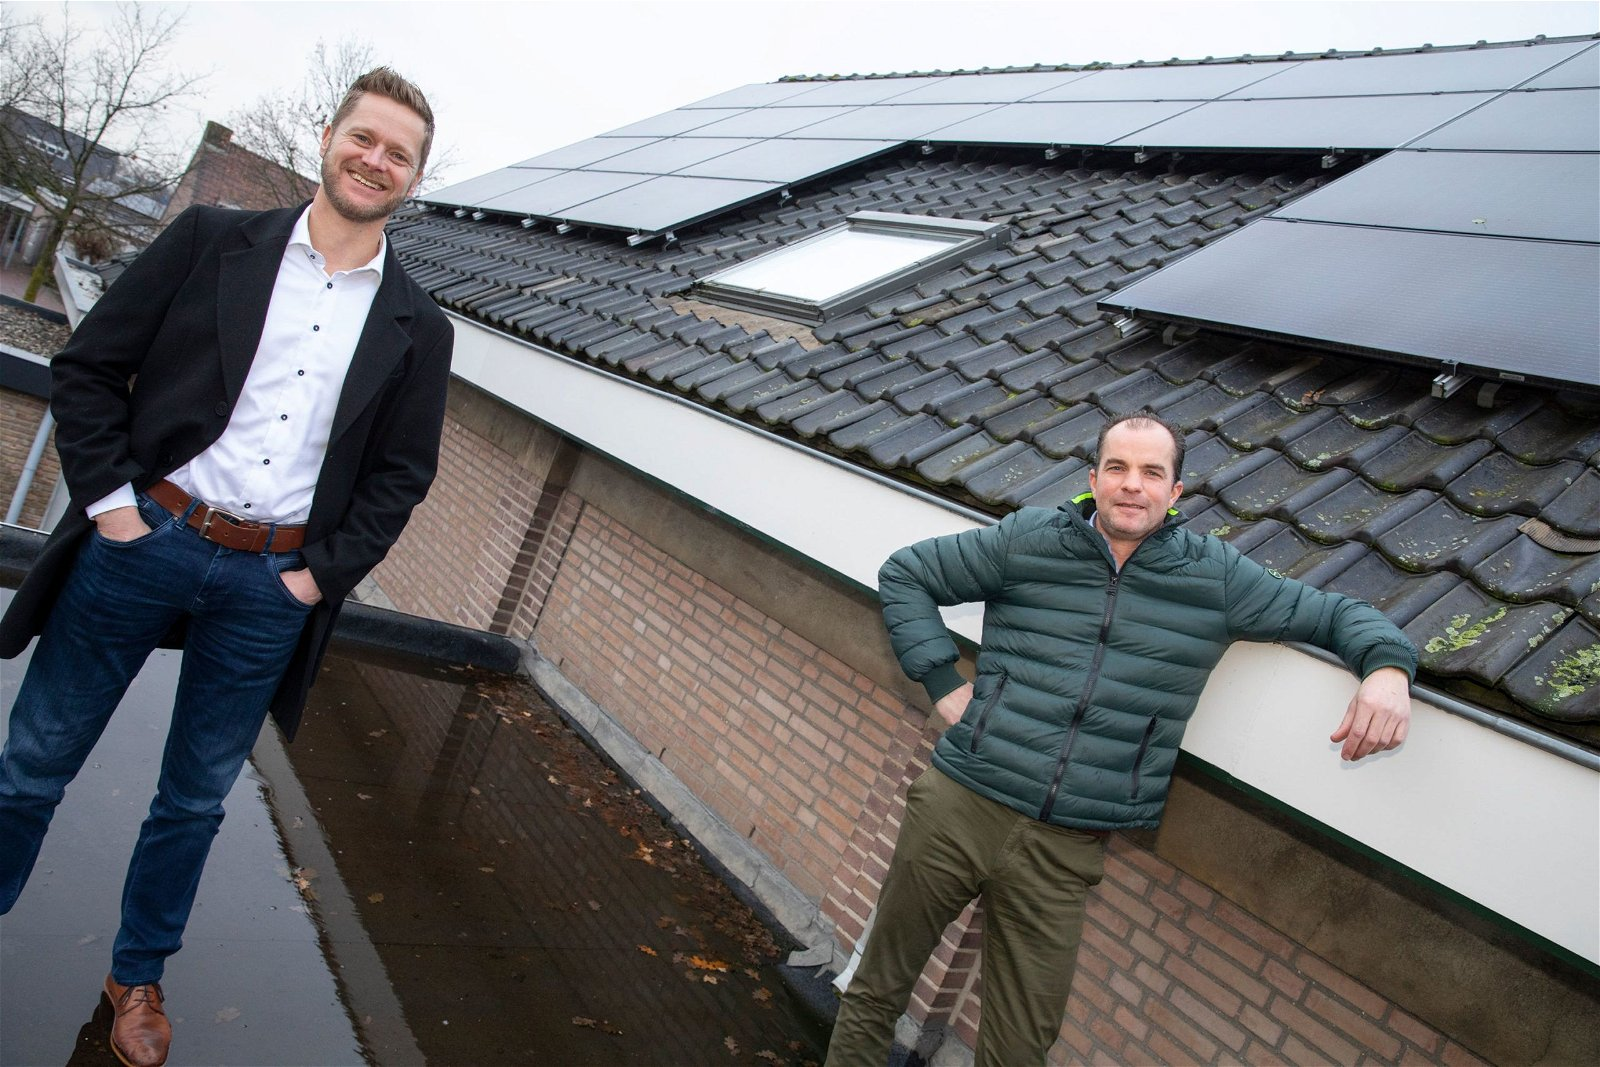 Wouter hendrikx Clusterleider Duurzaam en Projectleider Bas Tekath van Hoppenbrouwers Techniek